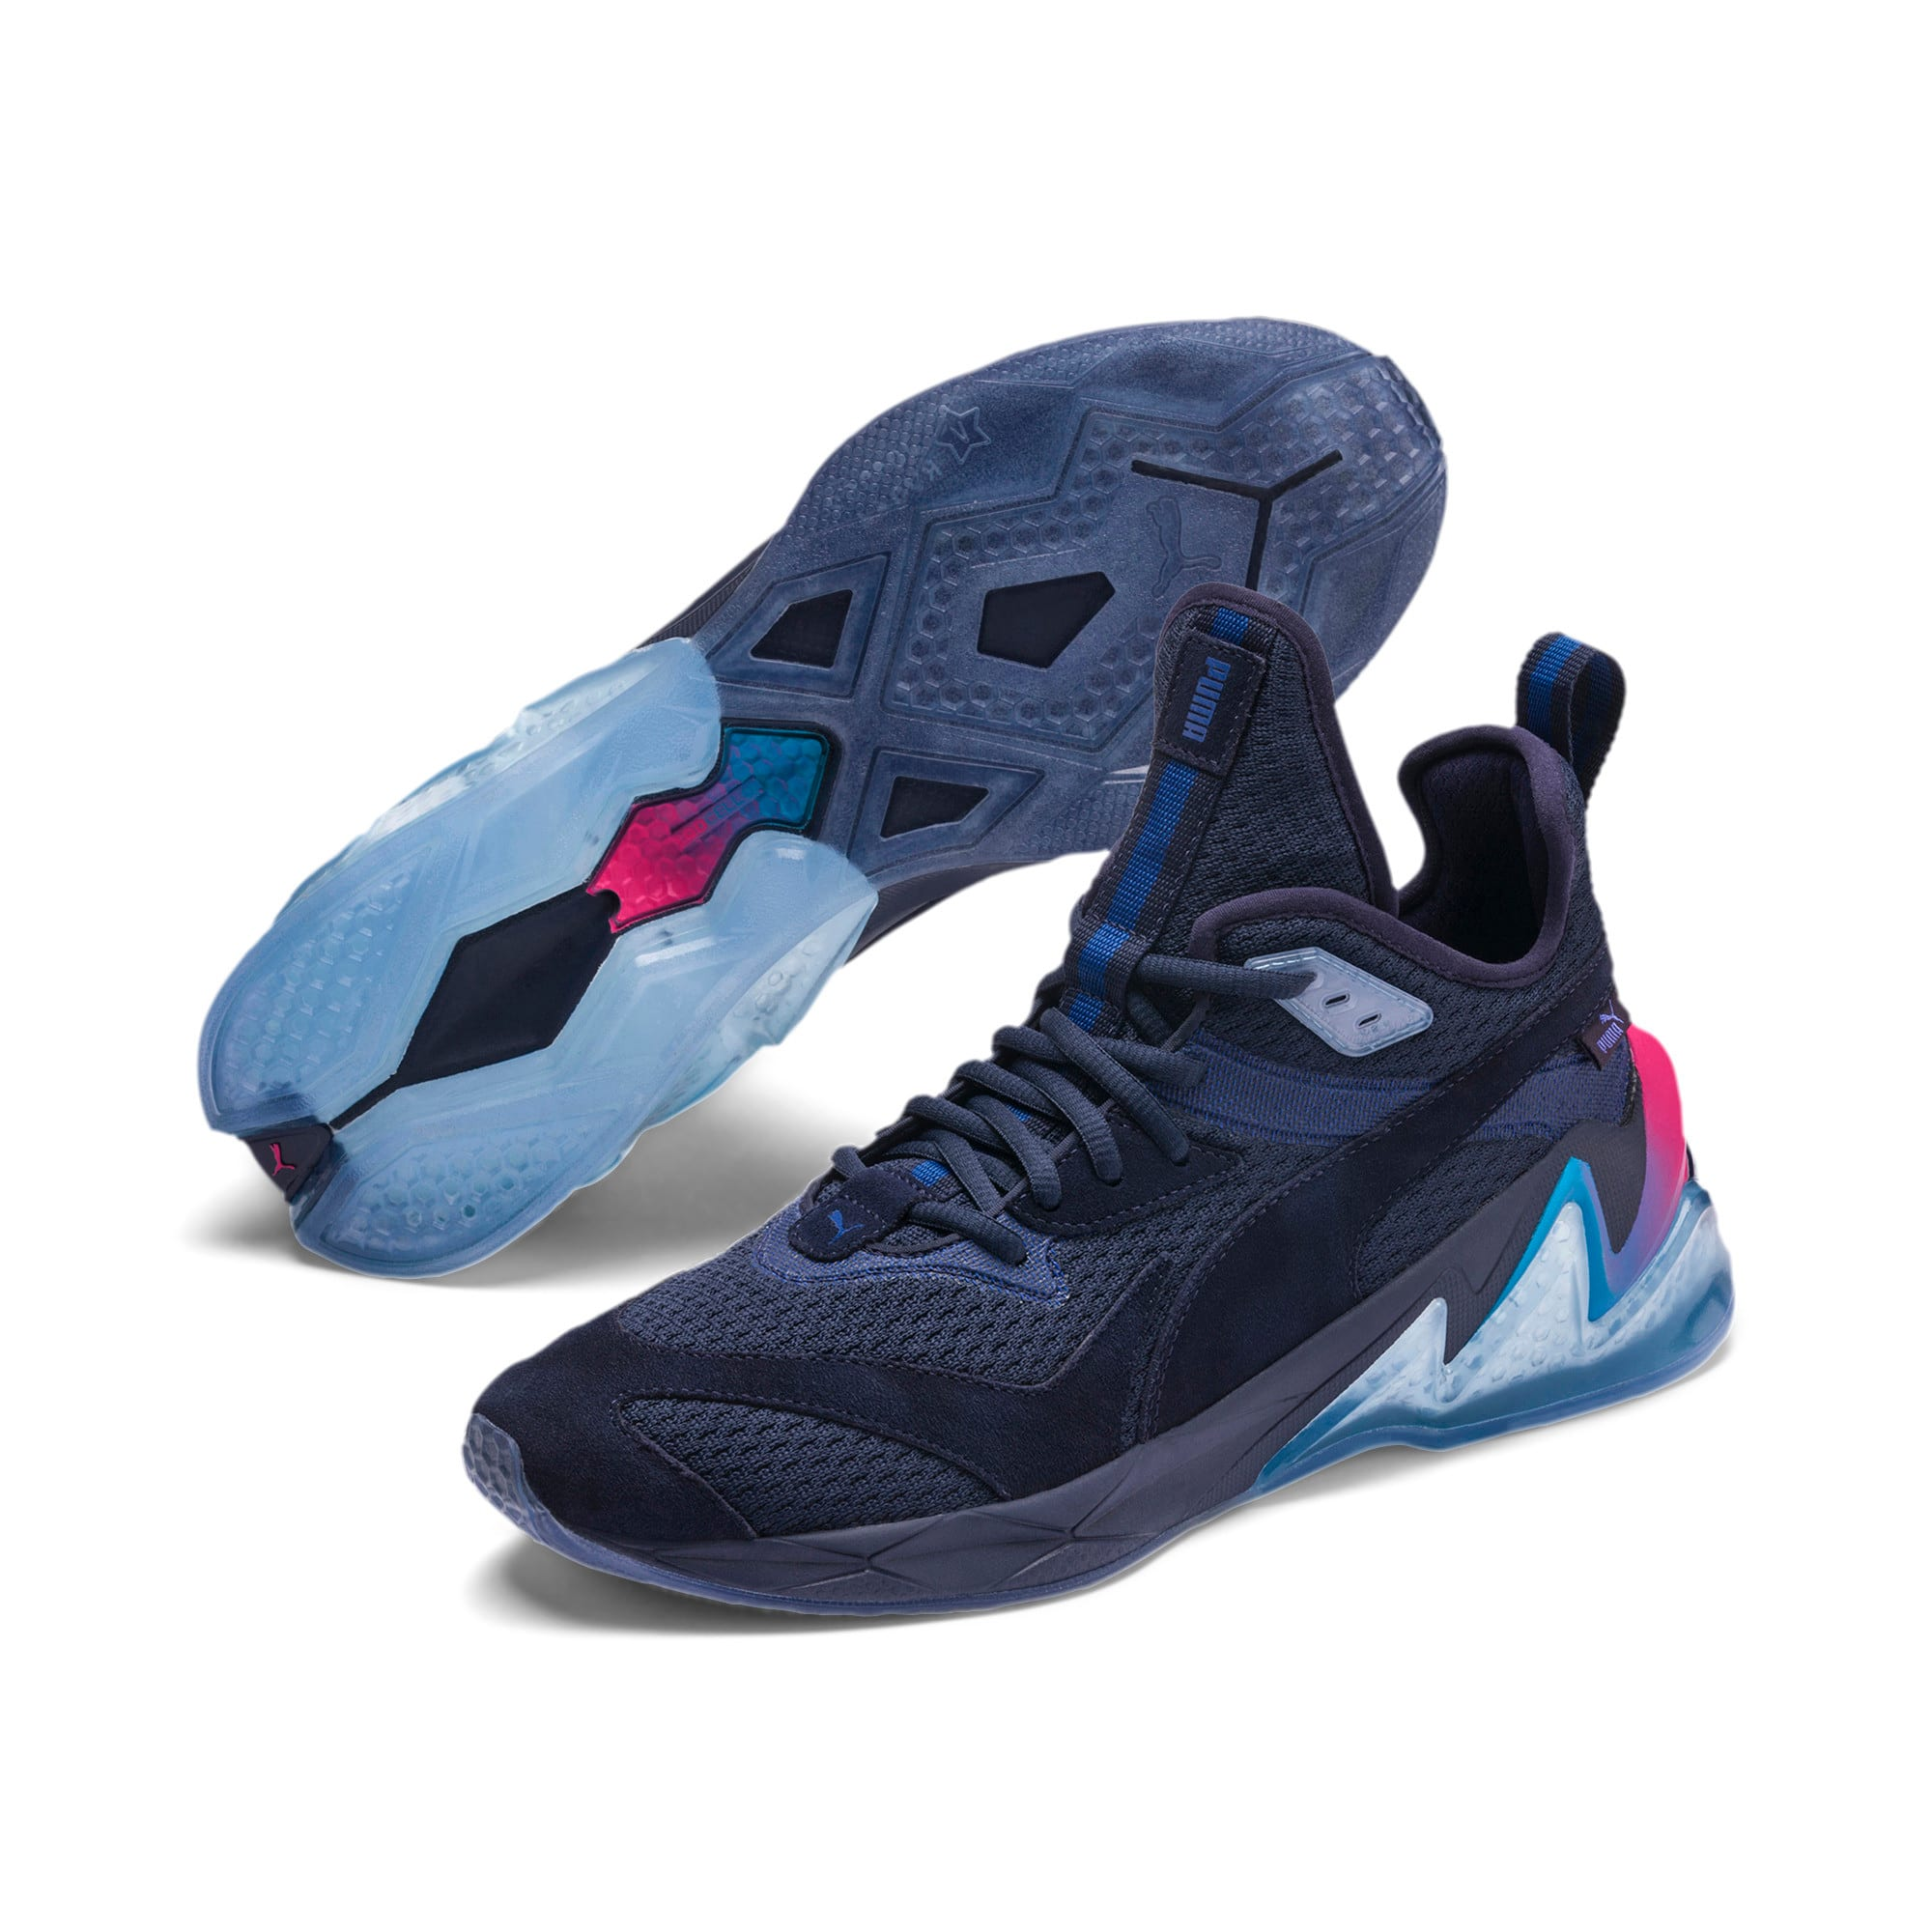 Thumbnail 2 of LQDCELL Origin Drone Night Men's Shoes, Peacat-Btr Prple-BLU Danube, medium